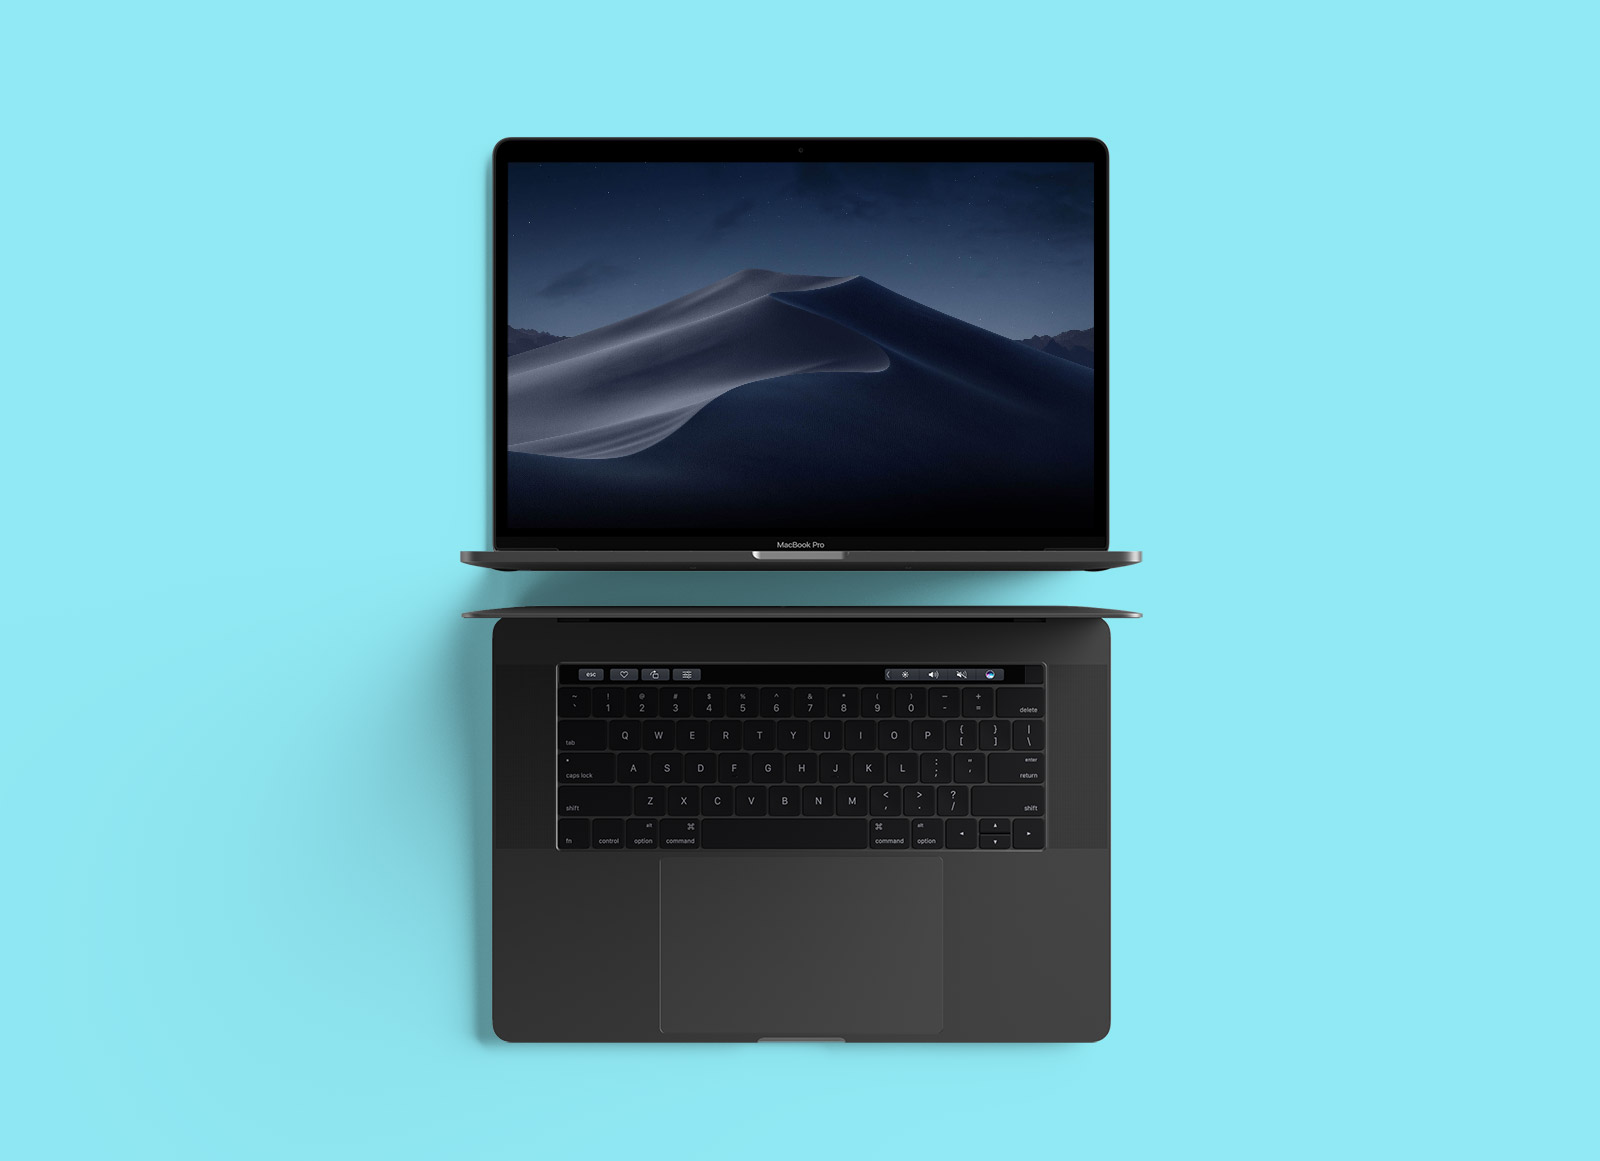 Free-Top-View-MacBook-Pro-Mockup-PSD